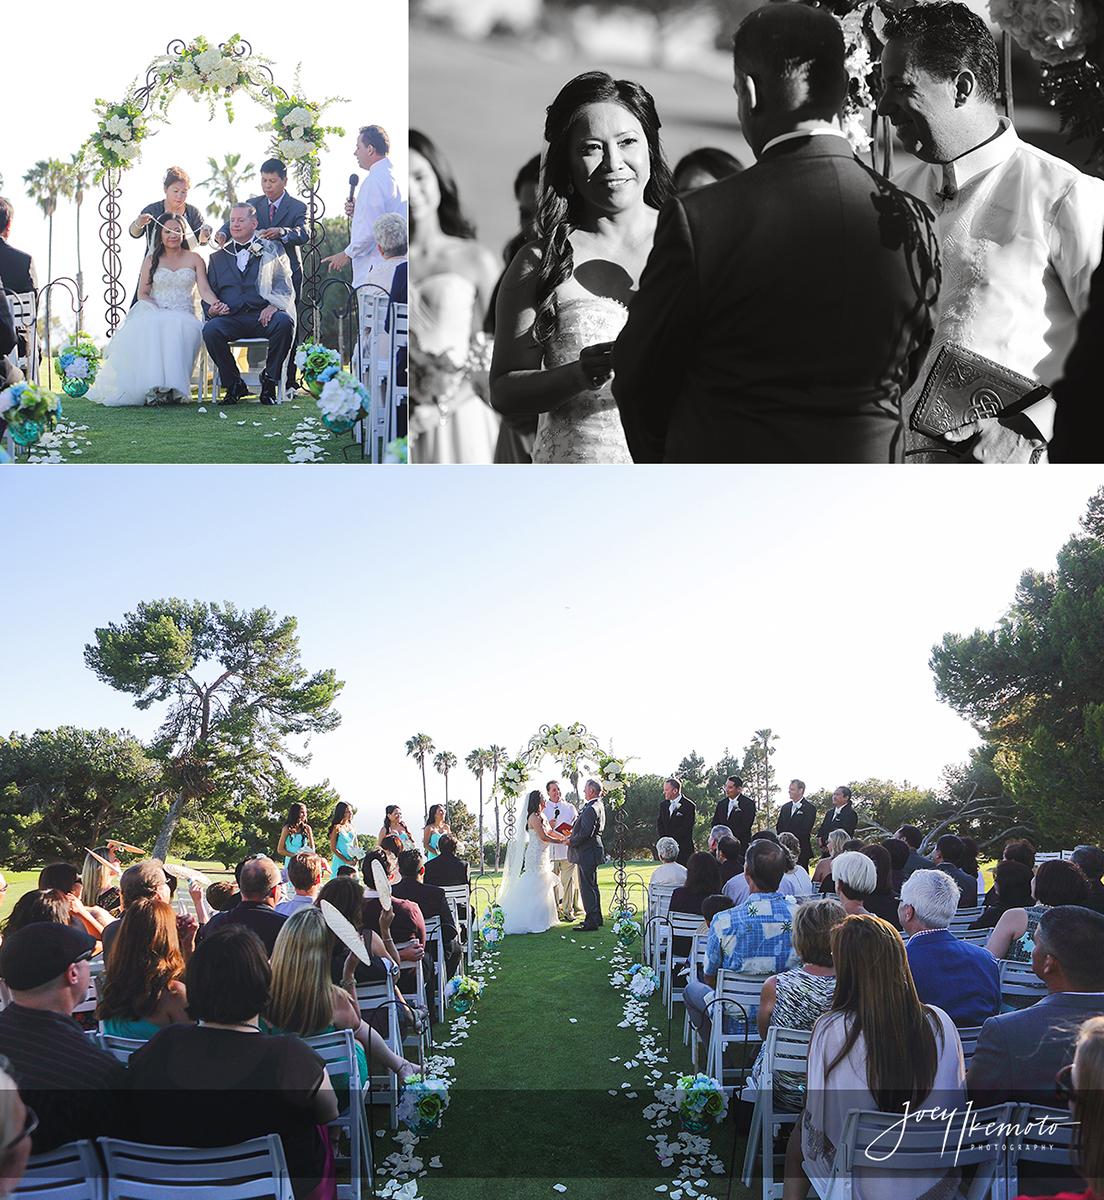 Terrena-Resort-Palos-verdes-and-La-Venta-Inn-Wedding_0028_Blog-Collage-1471479315164